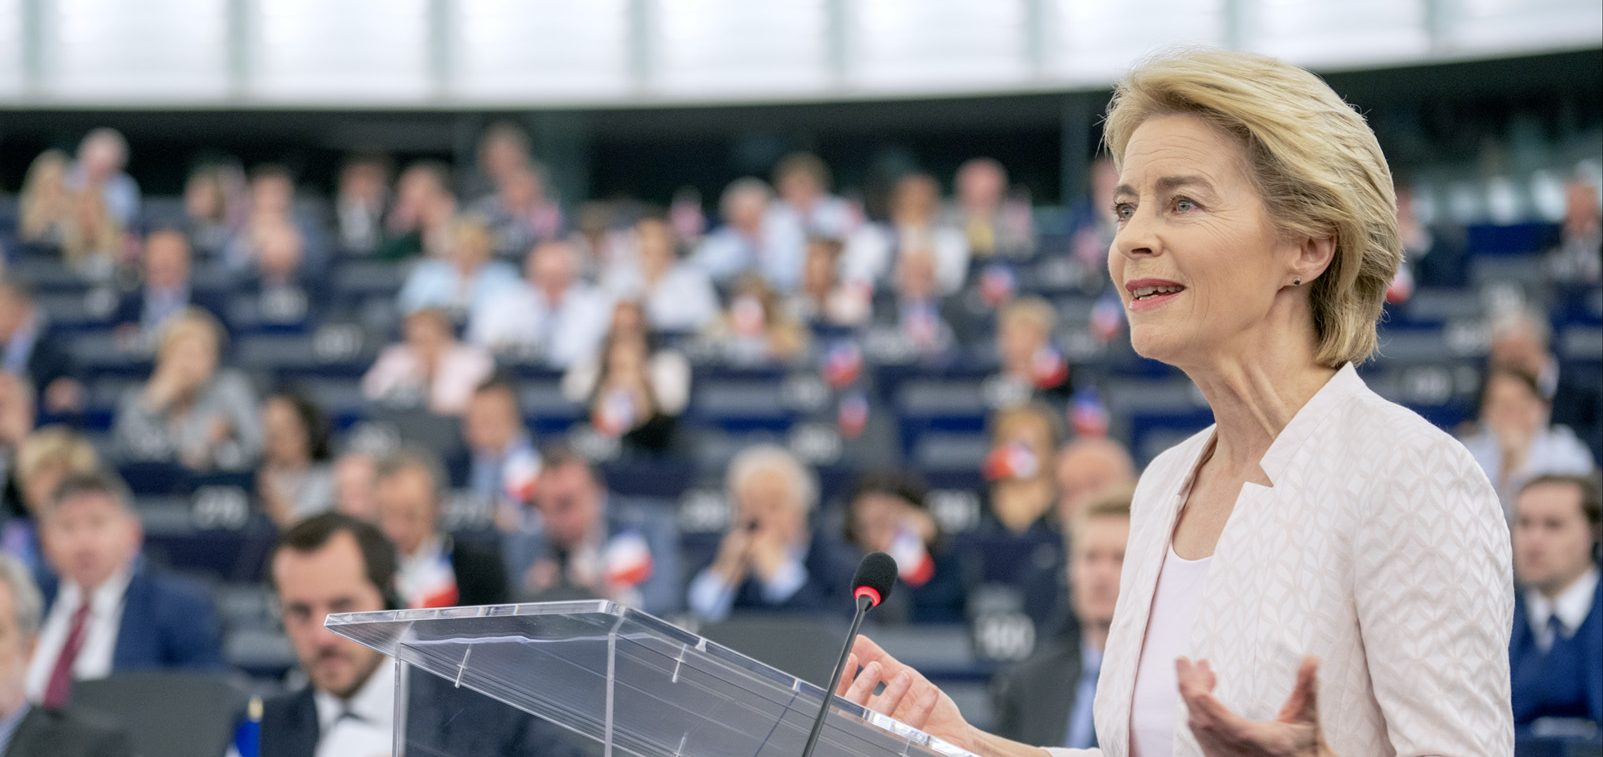 EU Parliament to vote on new European Commission